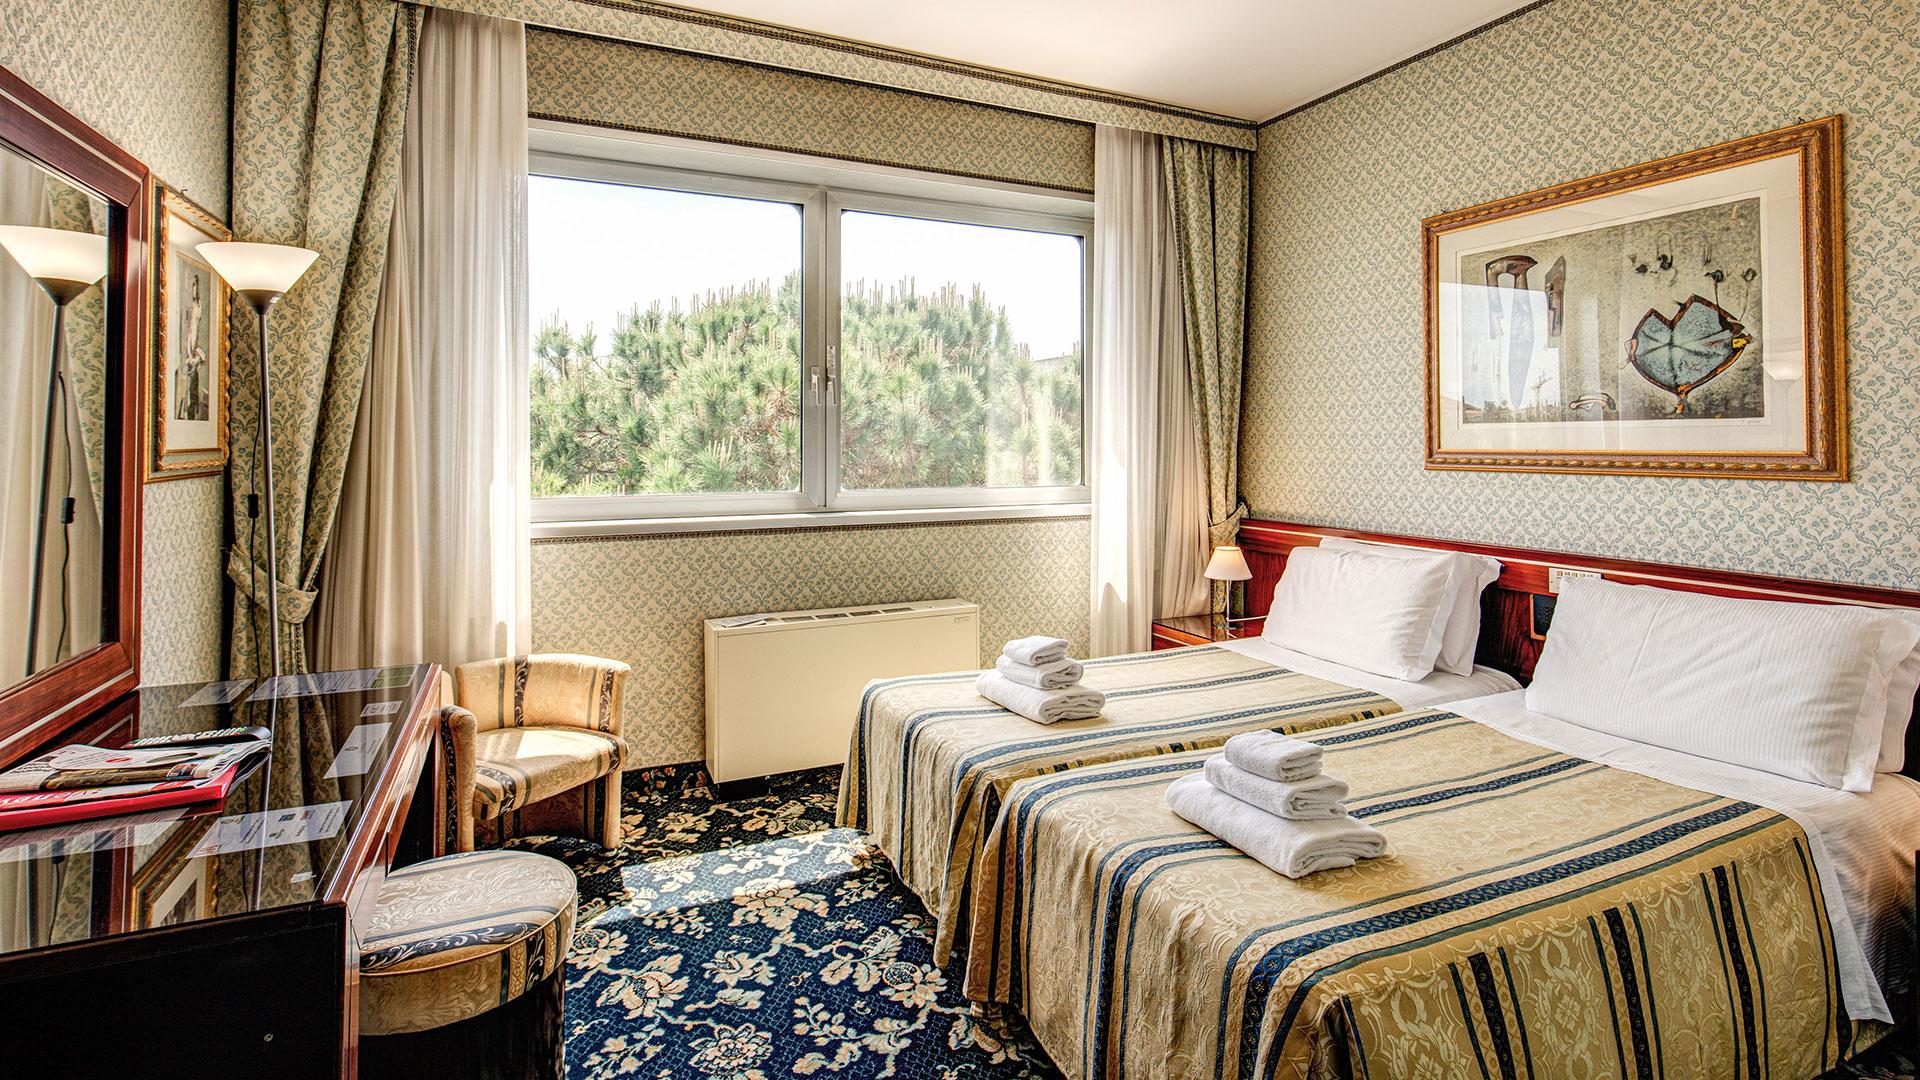 Venice Michelangelo Hotel - Official Website